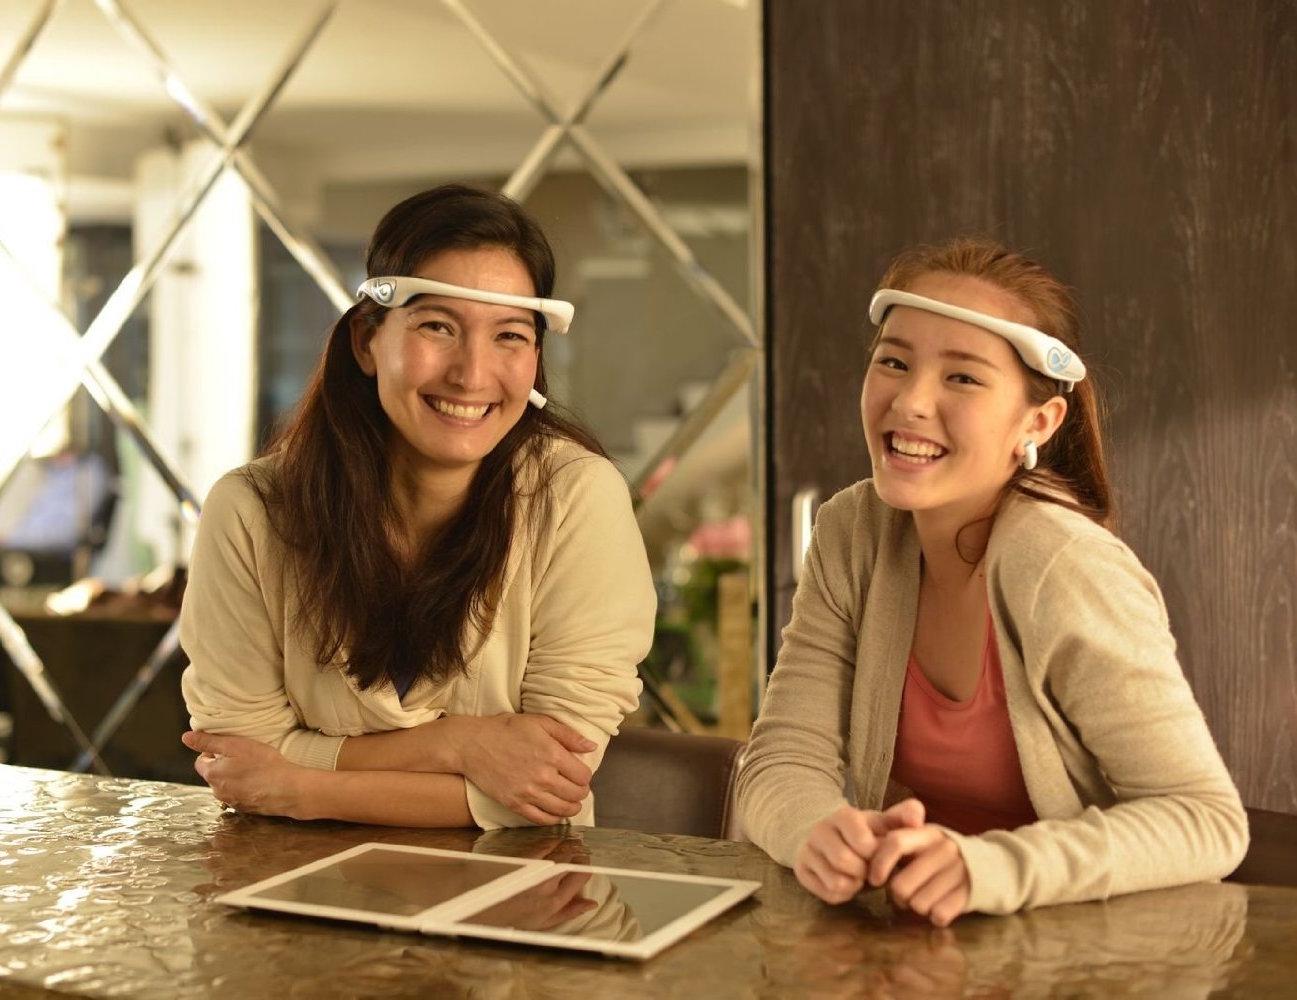 brainlink-portable-headset-02